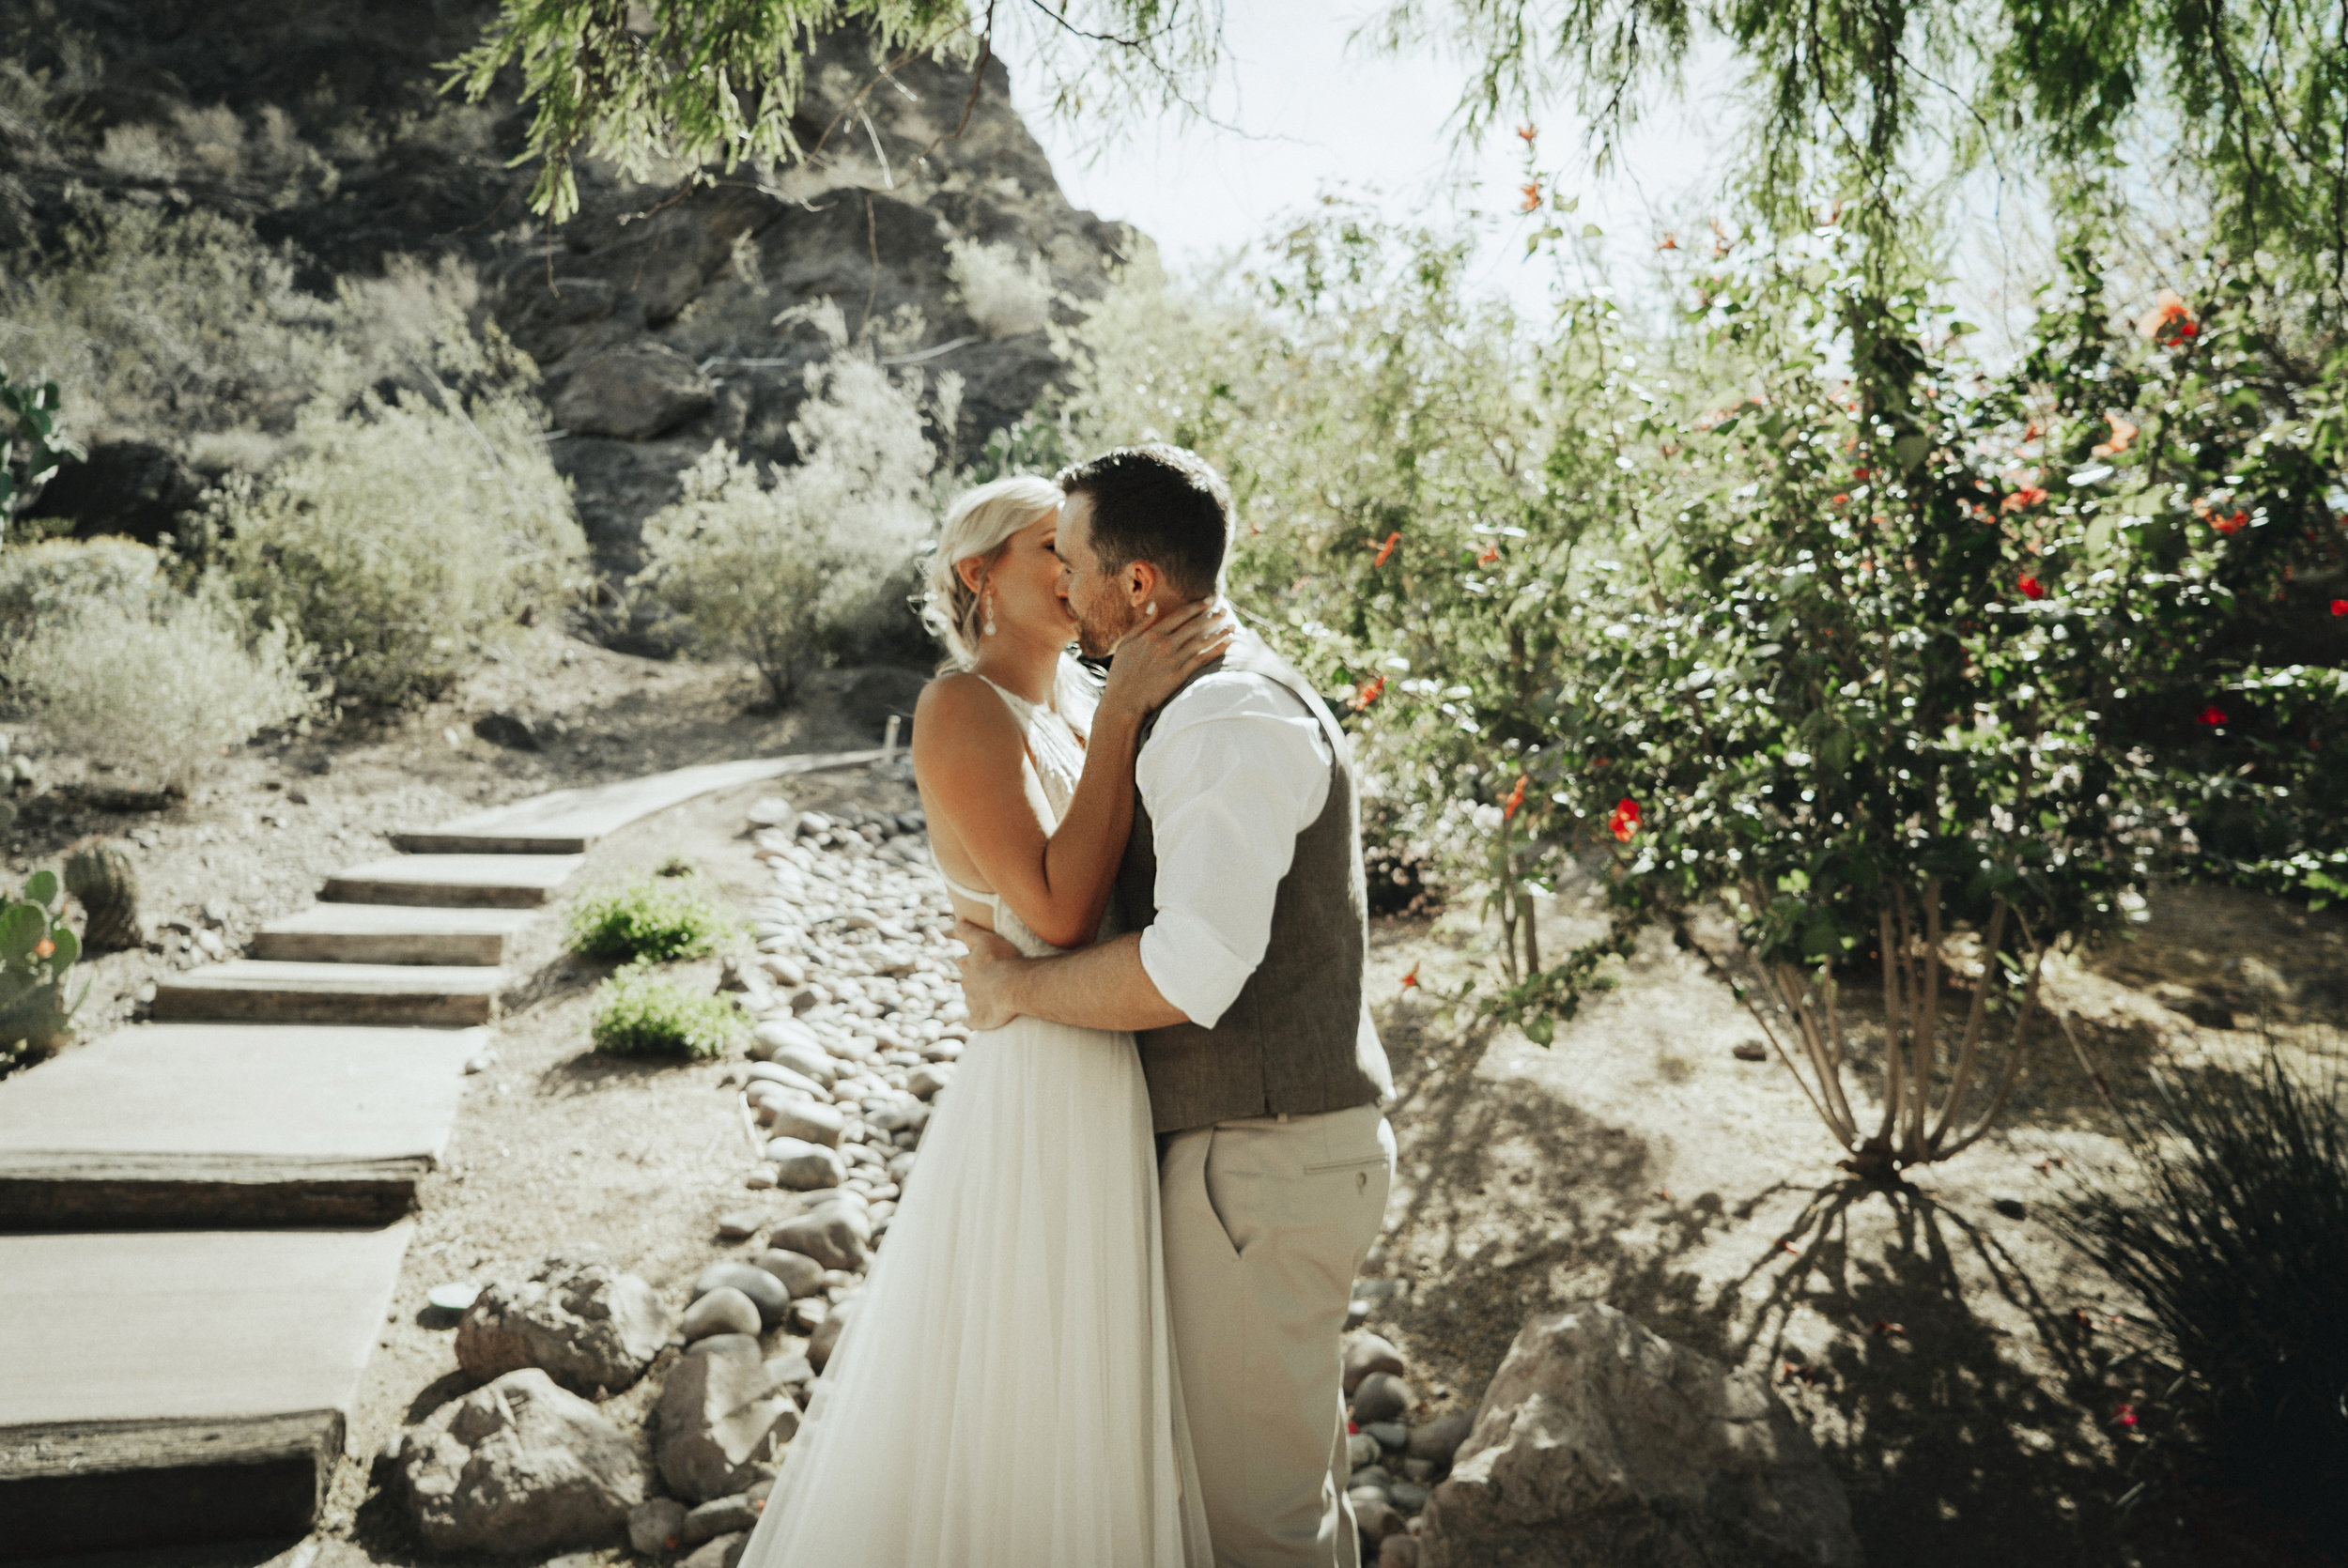 Chelsea & Cooper - These animal lovers' wedding at Liberty Wildlife sanctuary